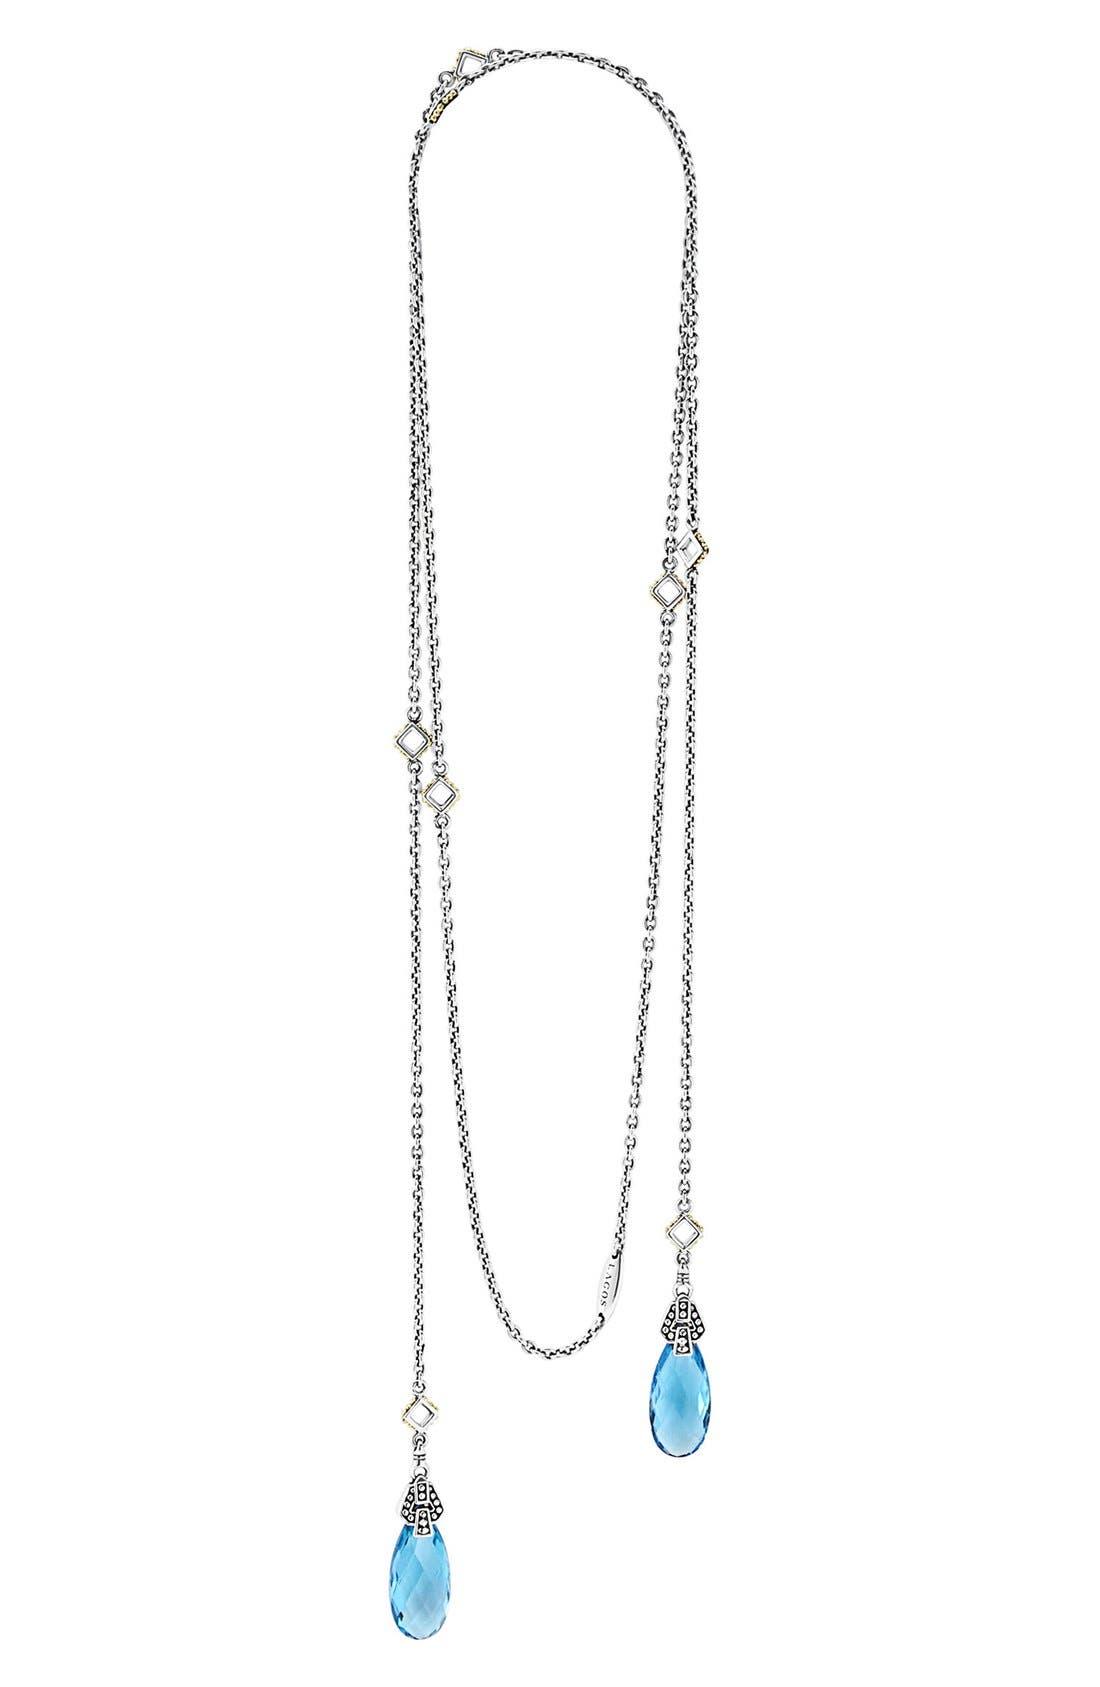 Alternate Image 1 Selected - LAGOS 'Caviar Color' Semiprecious Stone Lariat Necklace